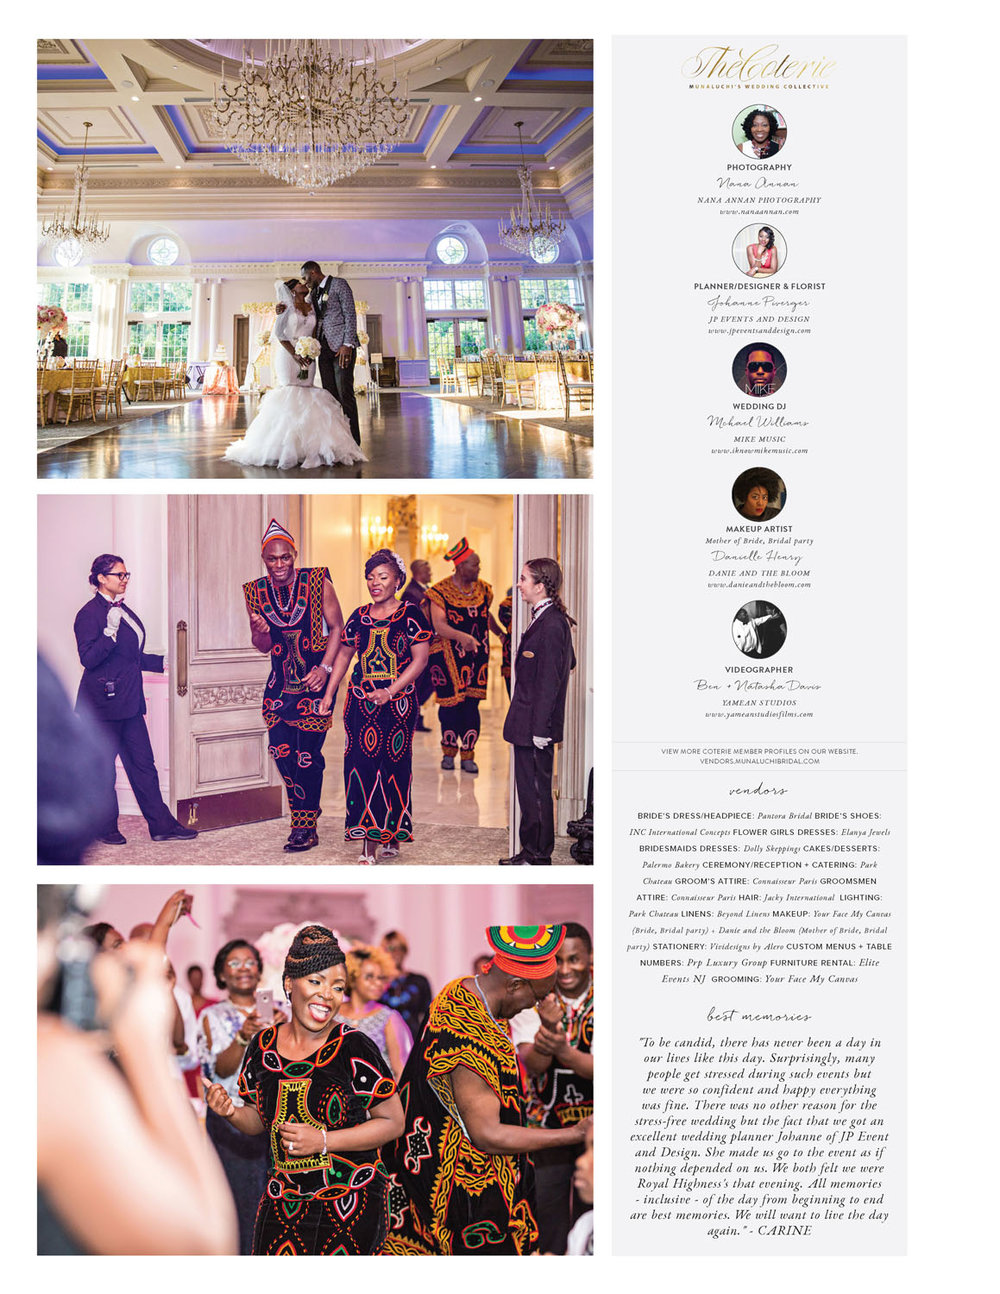 luxury_wedding_planner_and_floral_designer_new_York.jpg